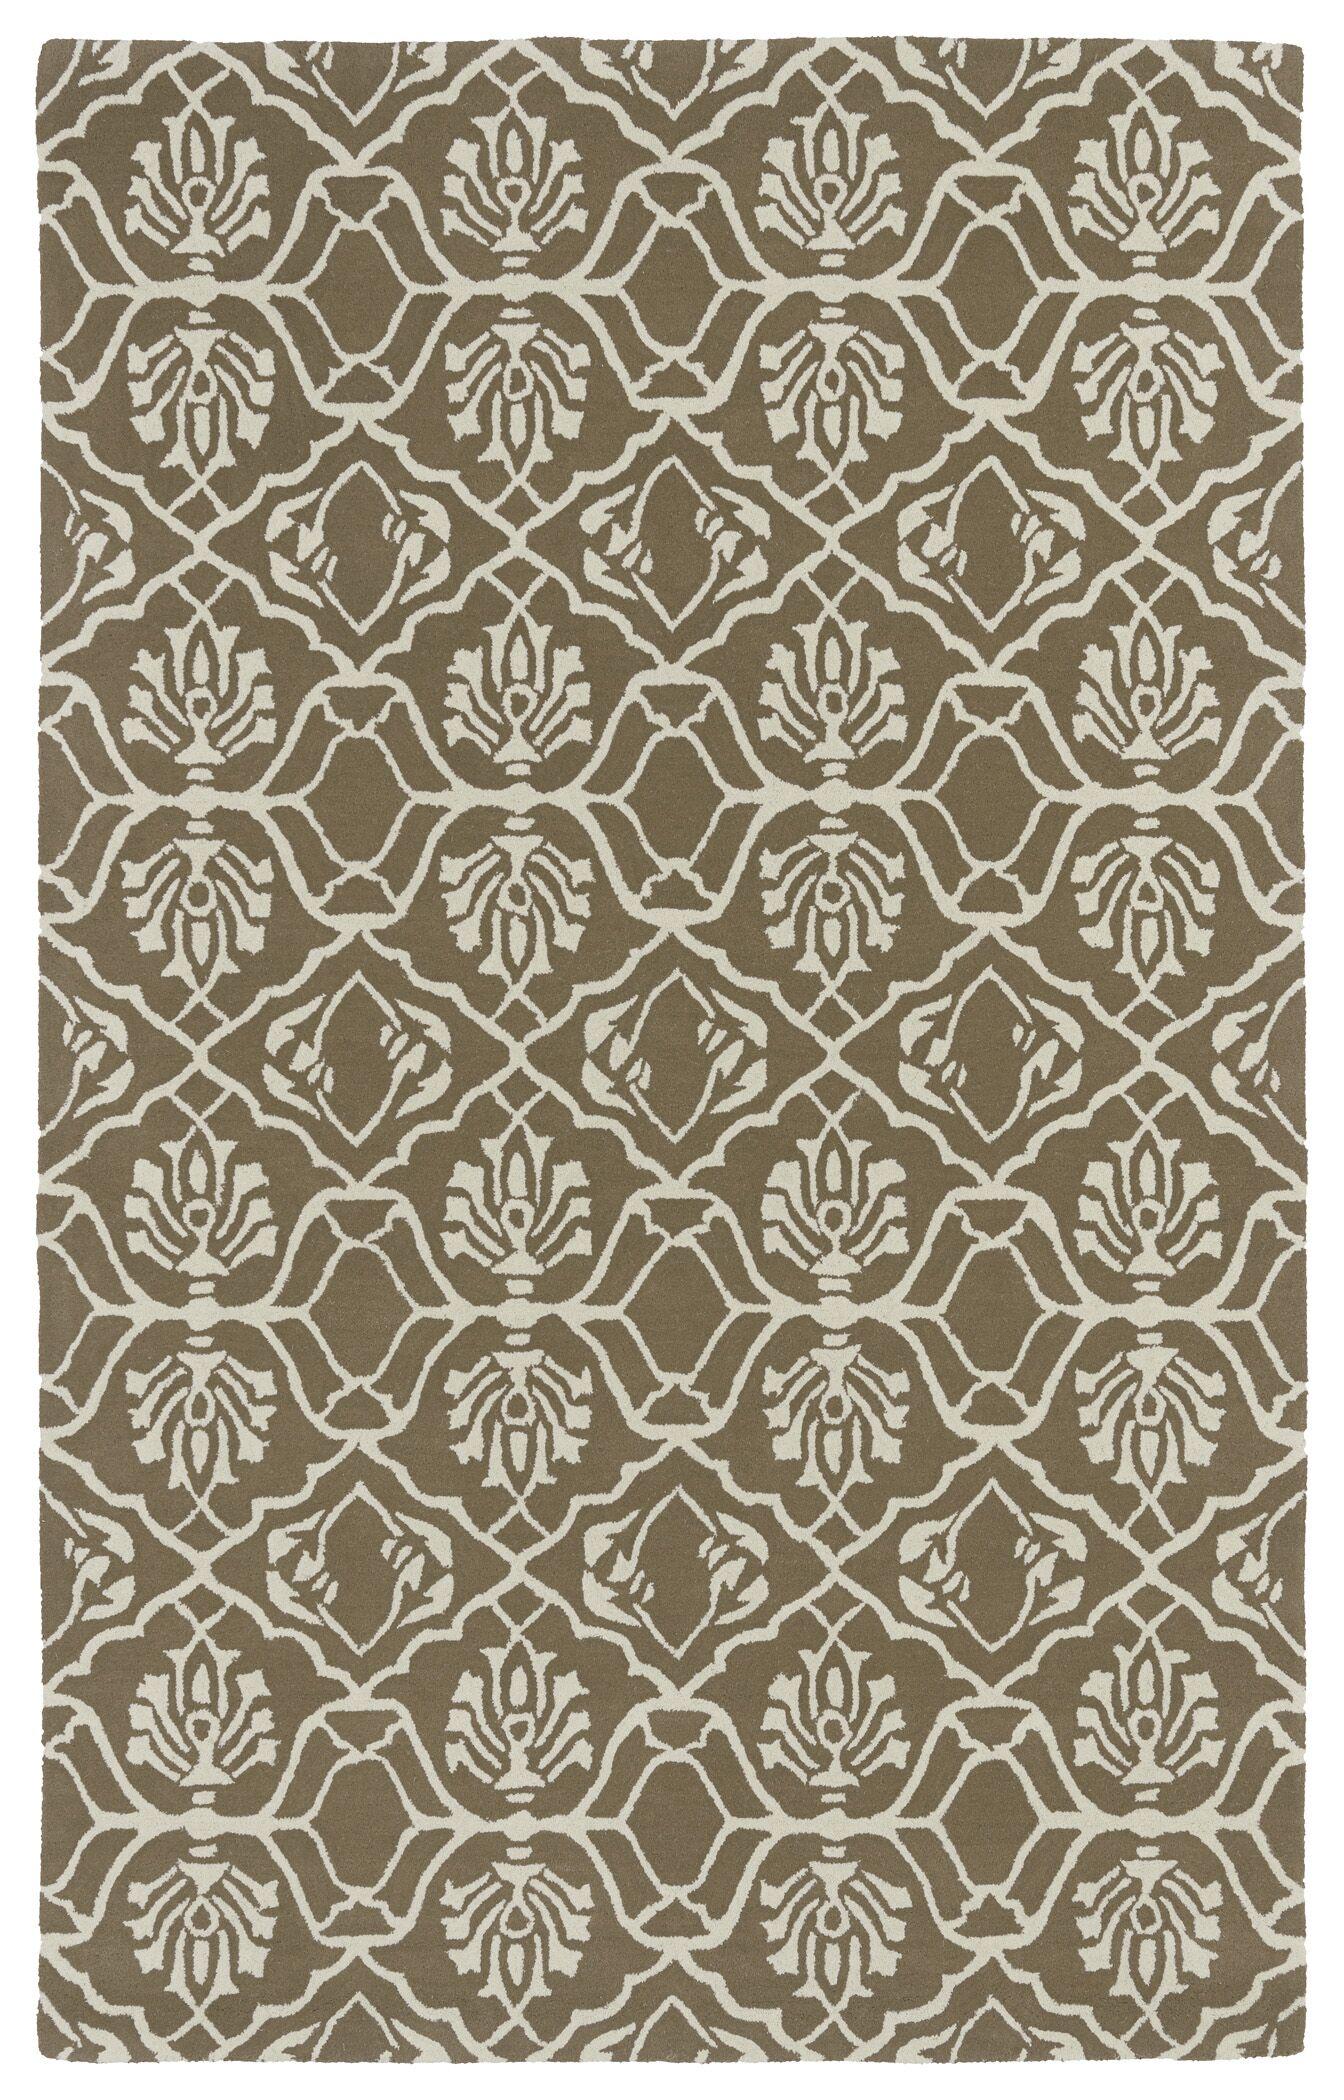 Corine Light Brown Area Rug Rug Size: Rectangle 8' x 11'